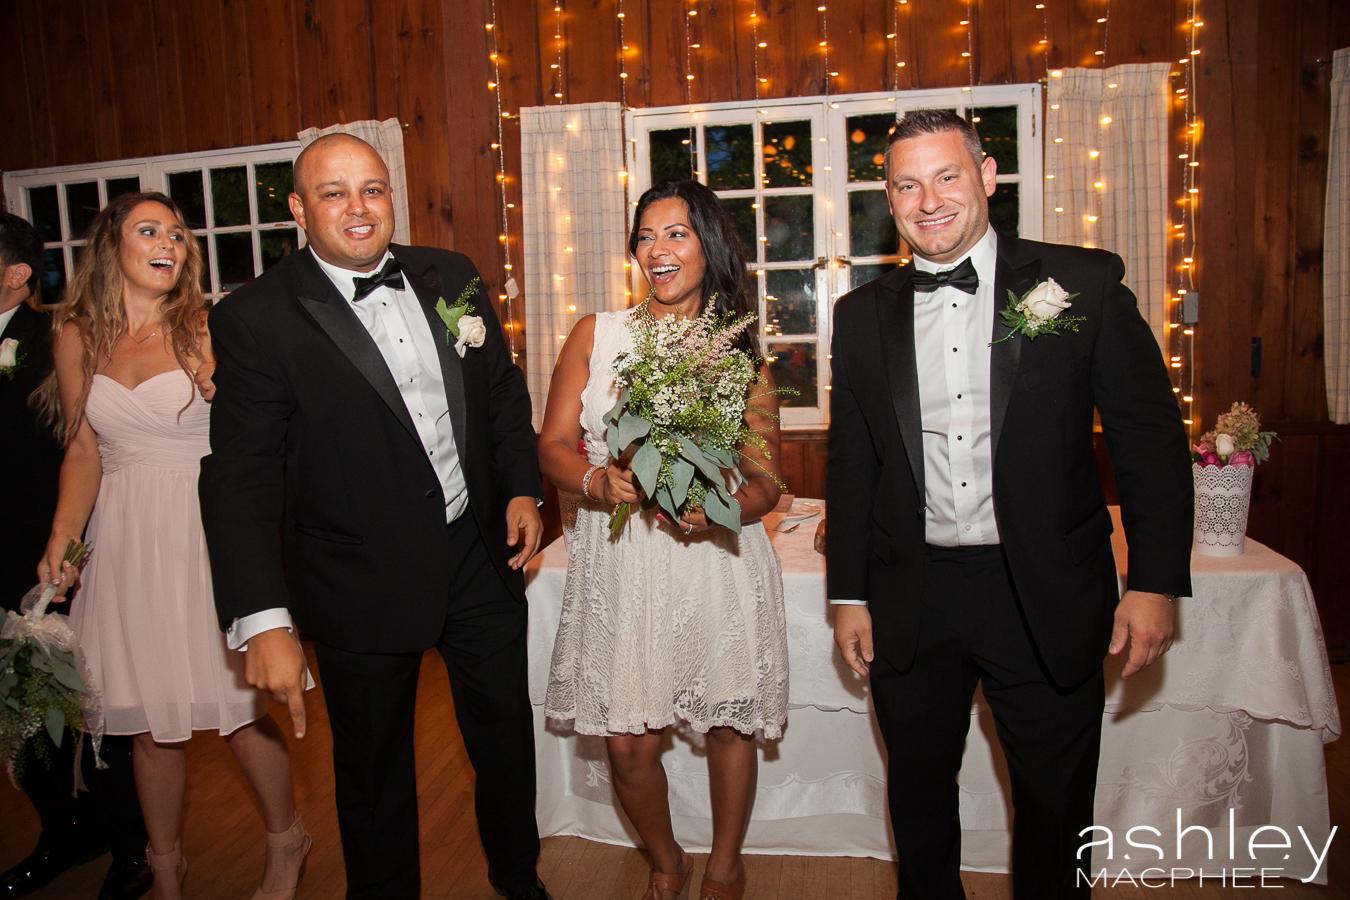 Ashley MacPhee Photography Hudson Yacht Club wedding photographer (80 of 112).jpg